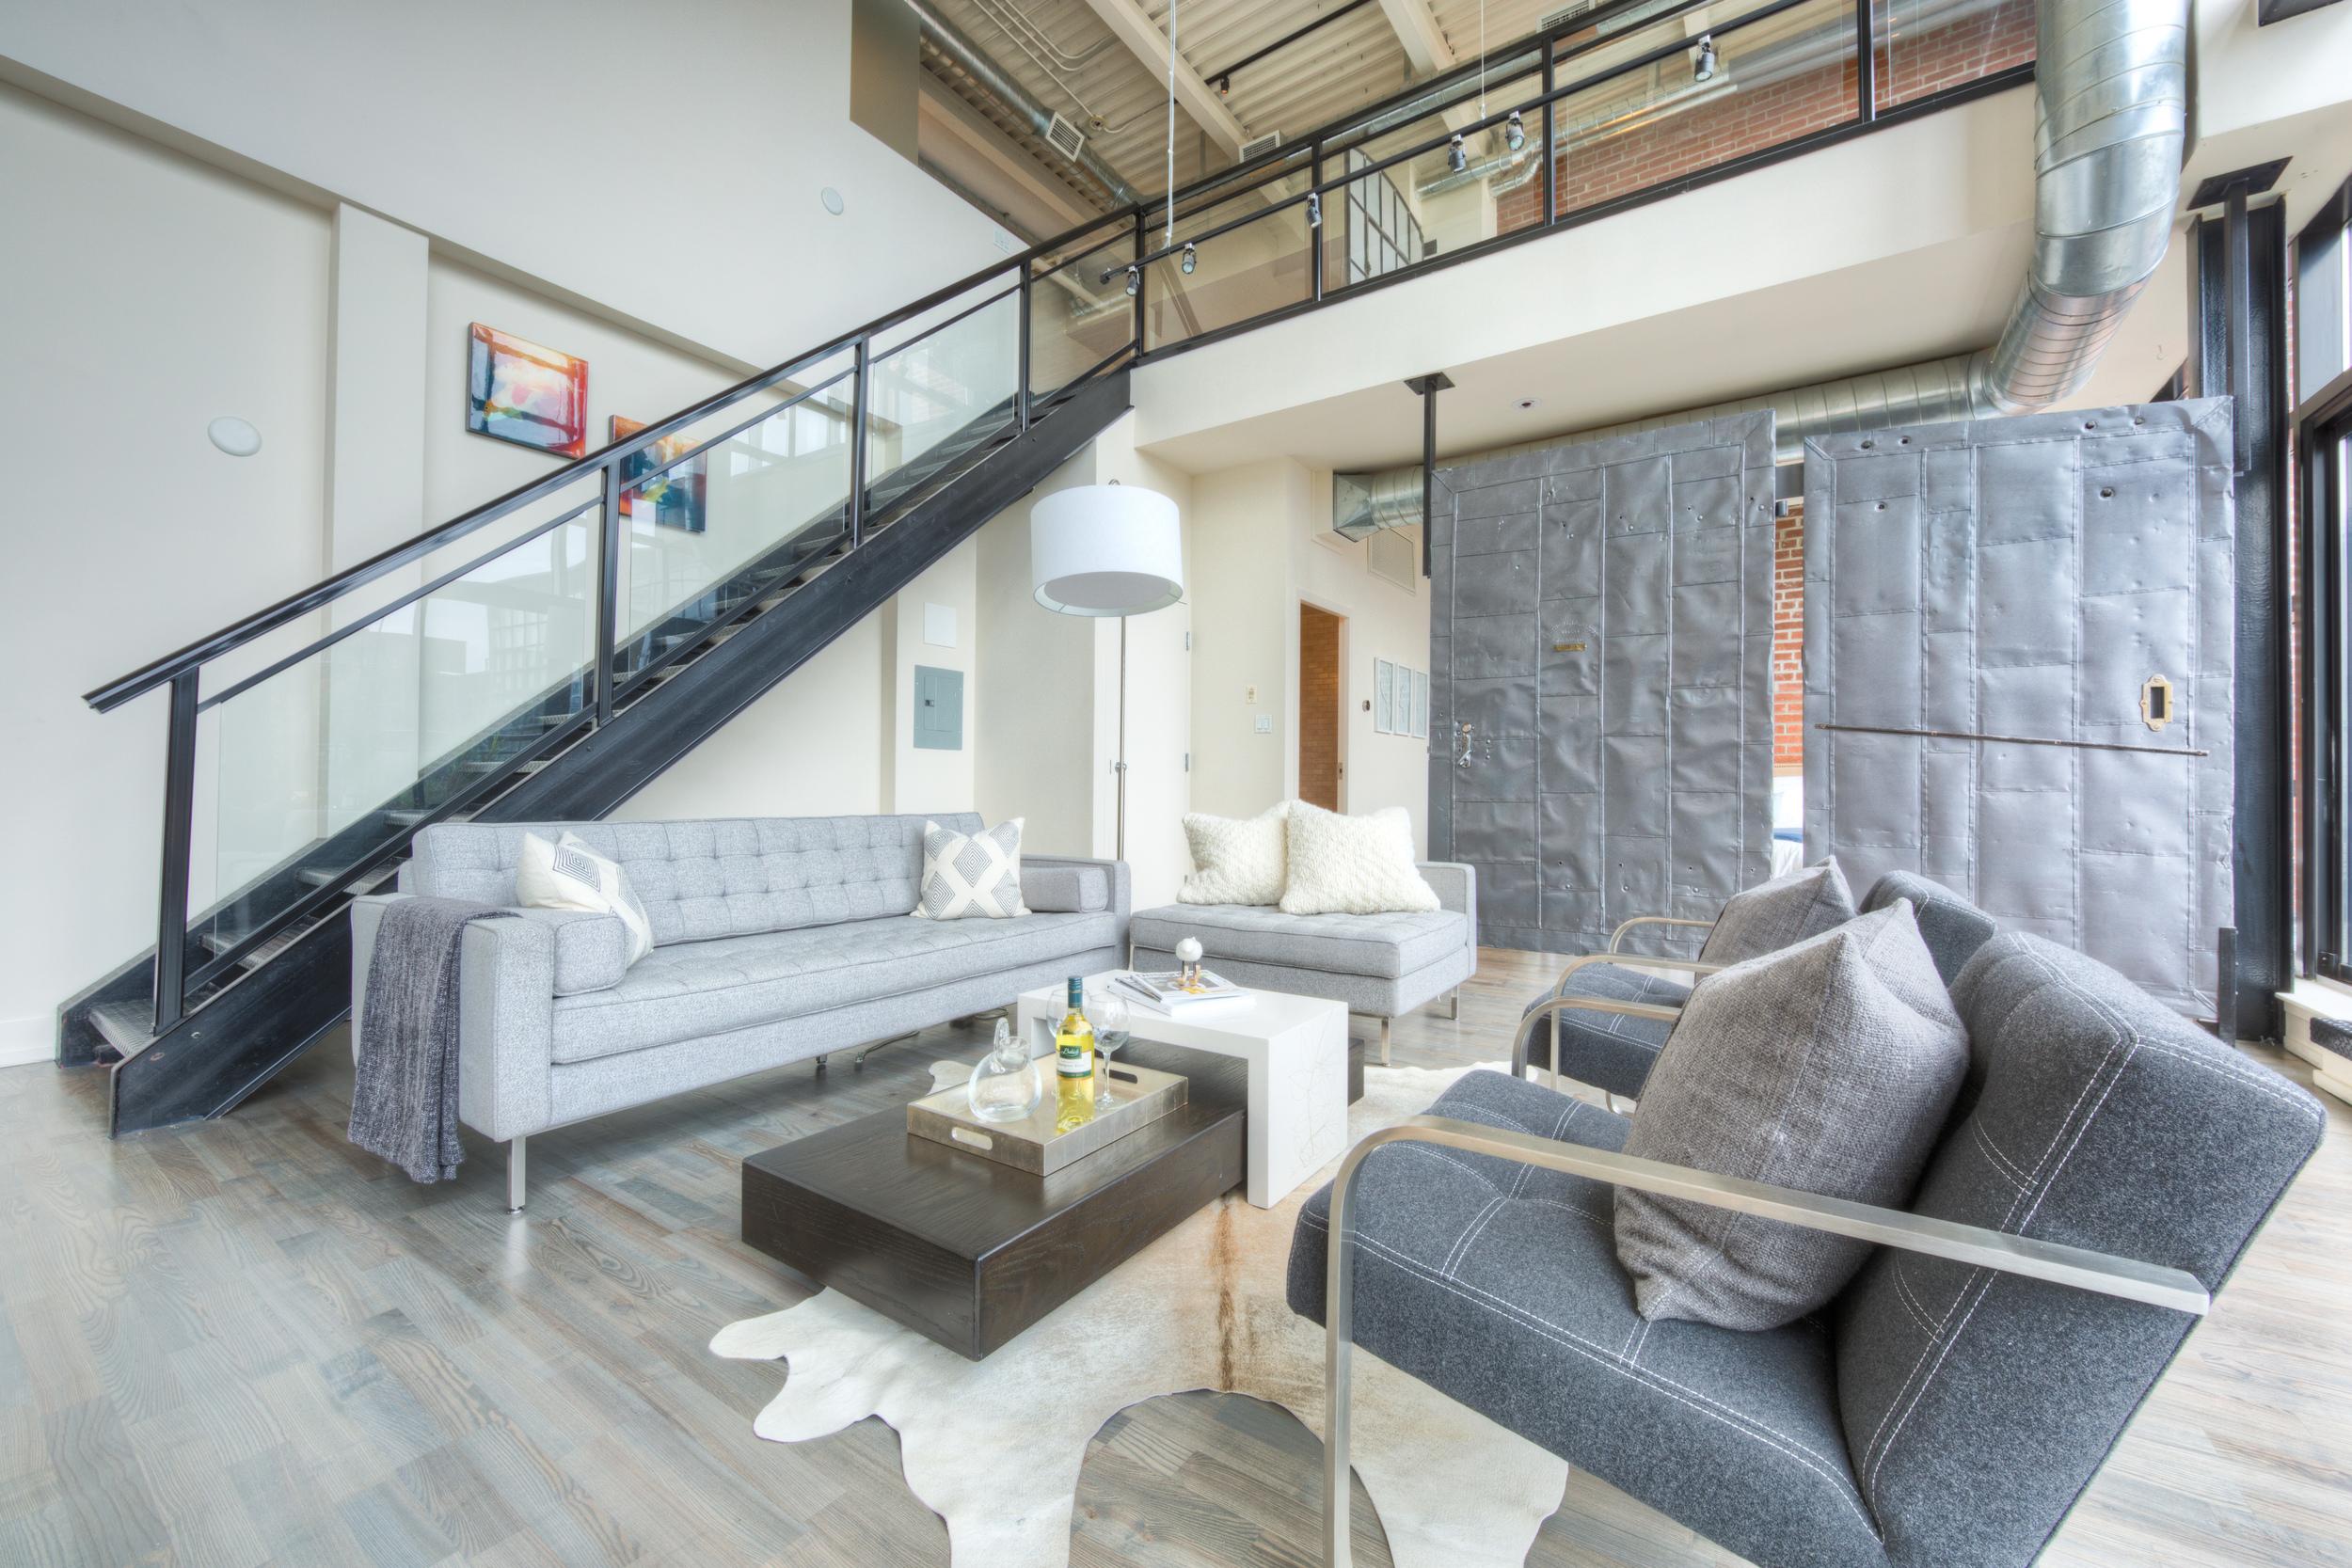 Loft Staging for Sale - Entertainment area